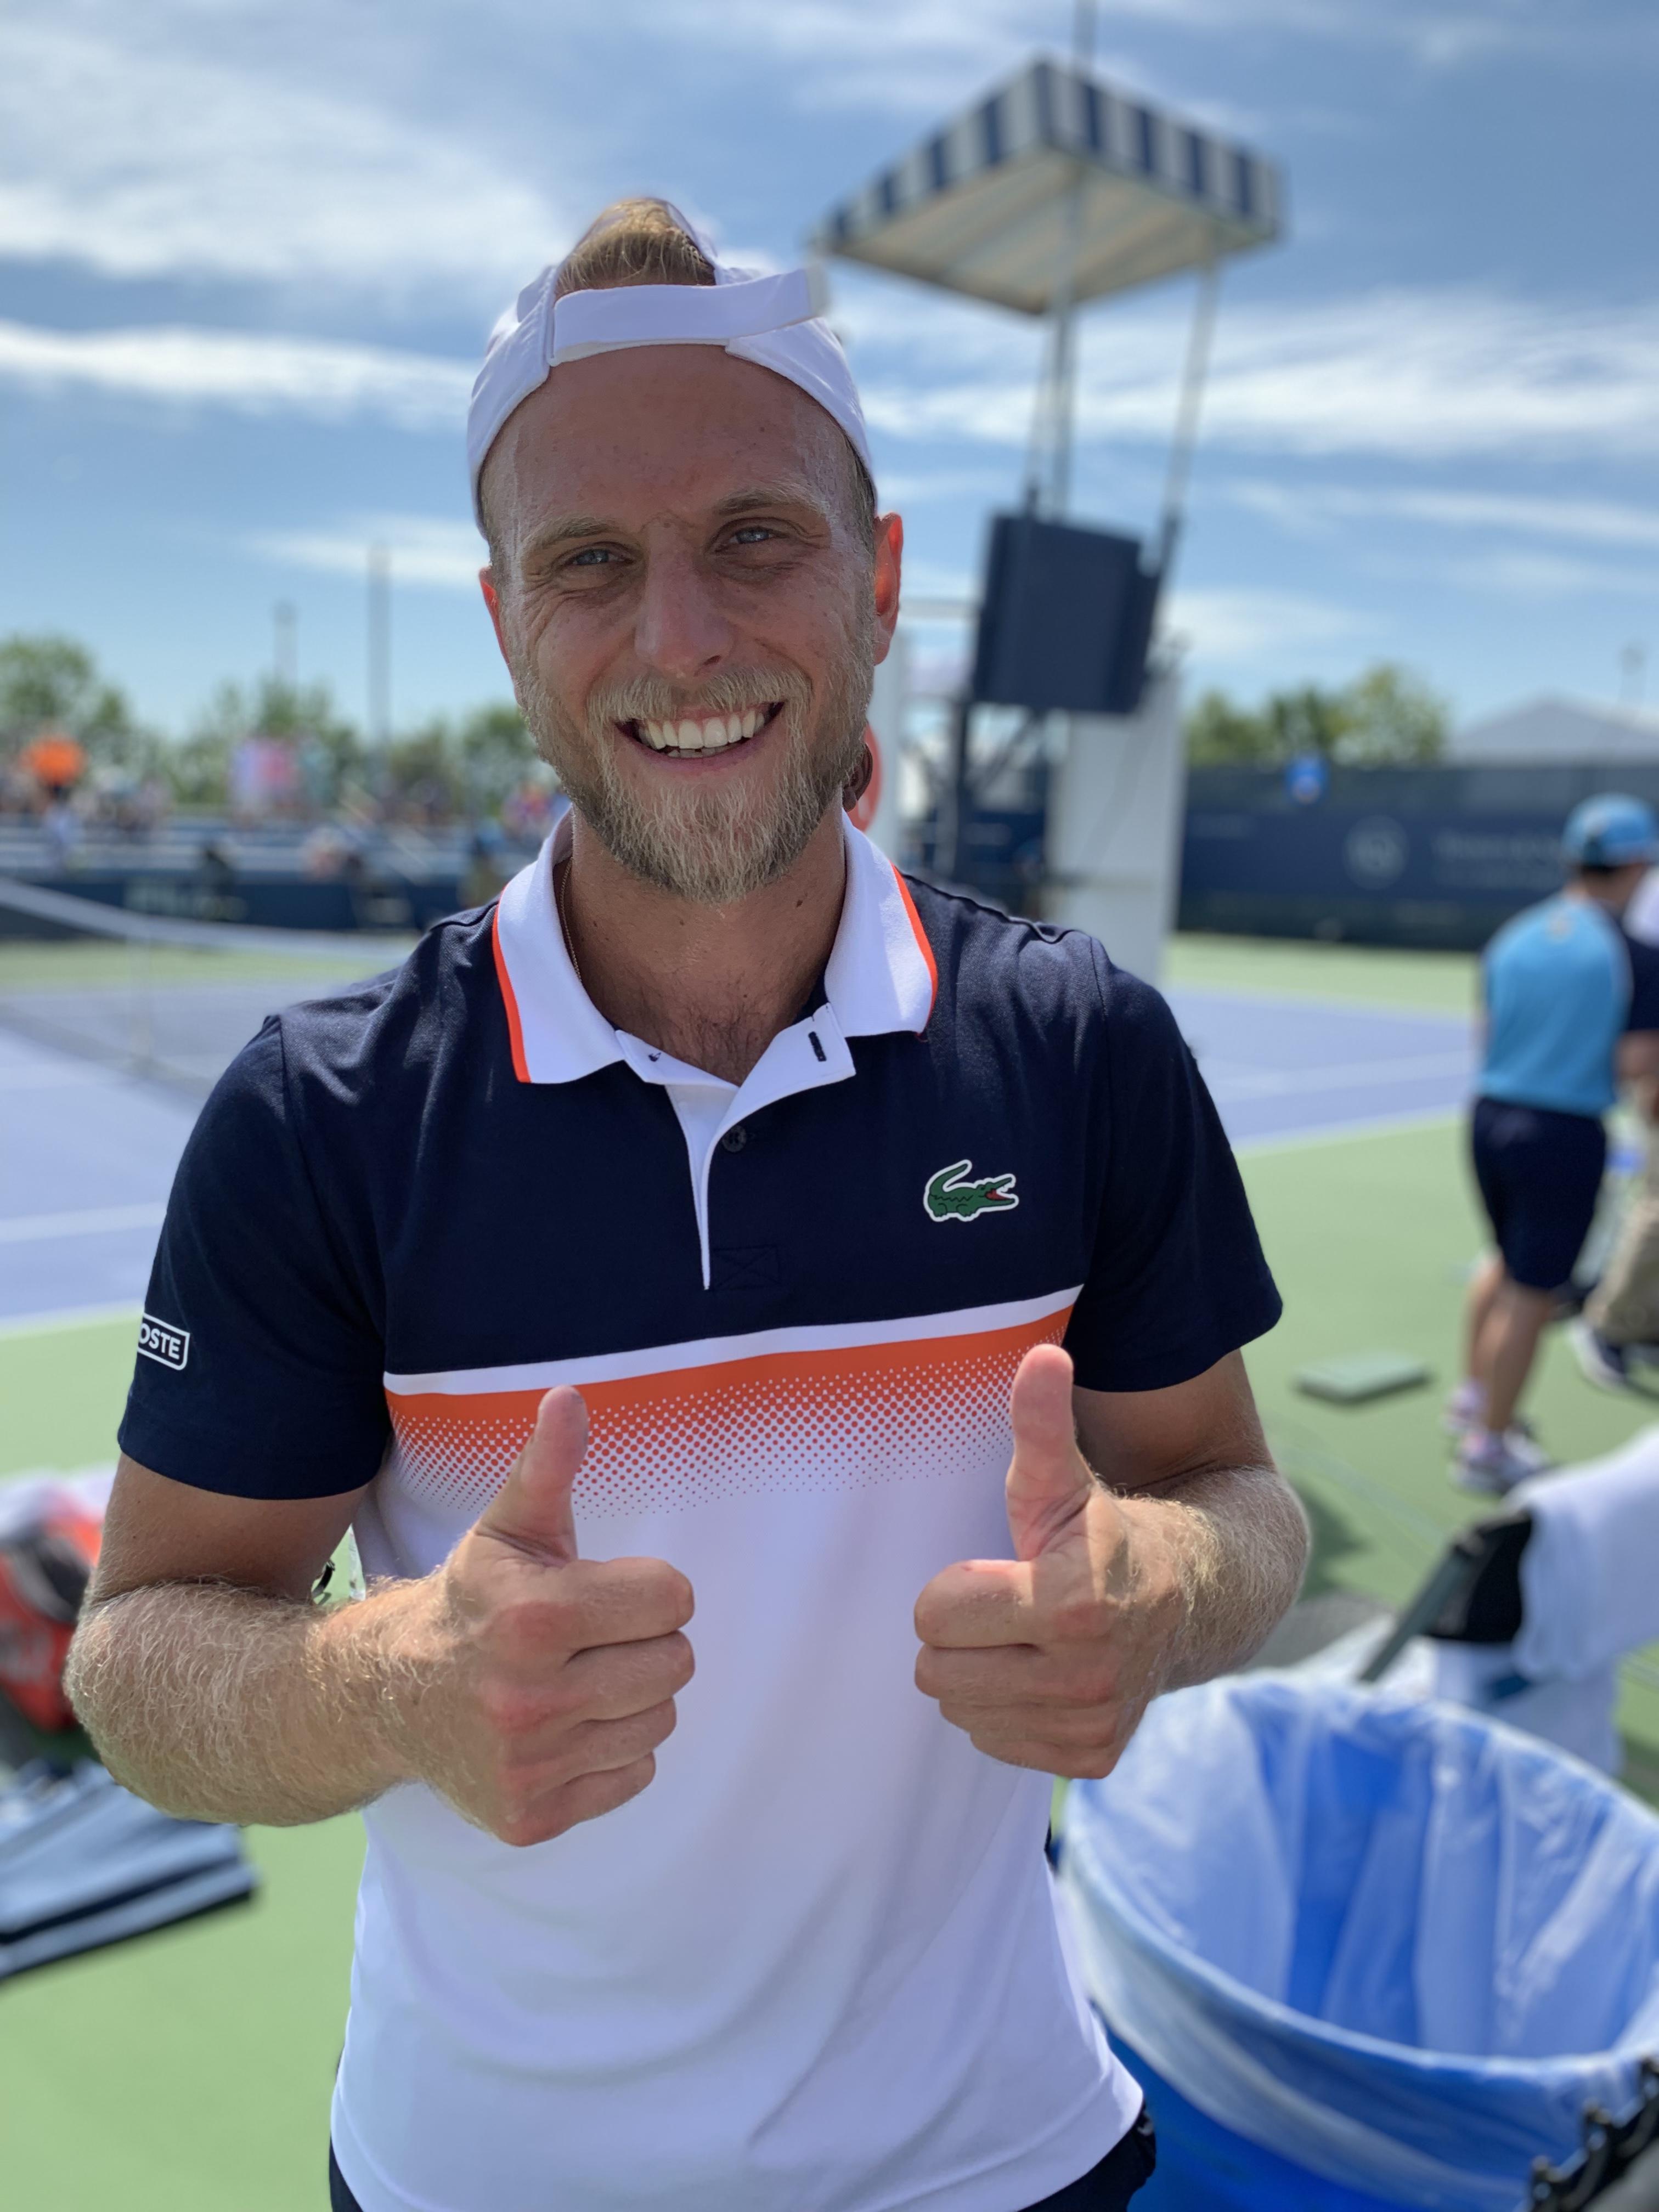 Denis Kudla, 2019 Western & Southern Open (Photo: Mike Renz for TennisAtlantic.com)